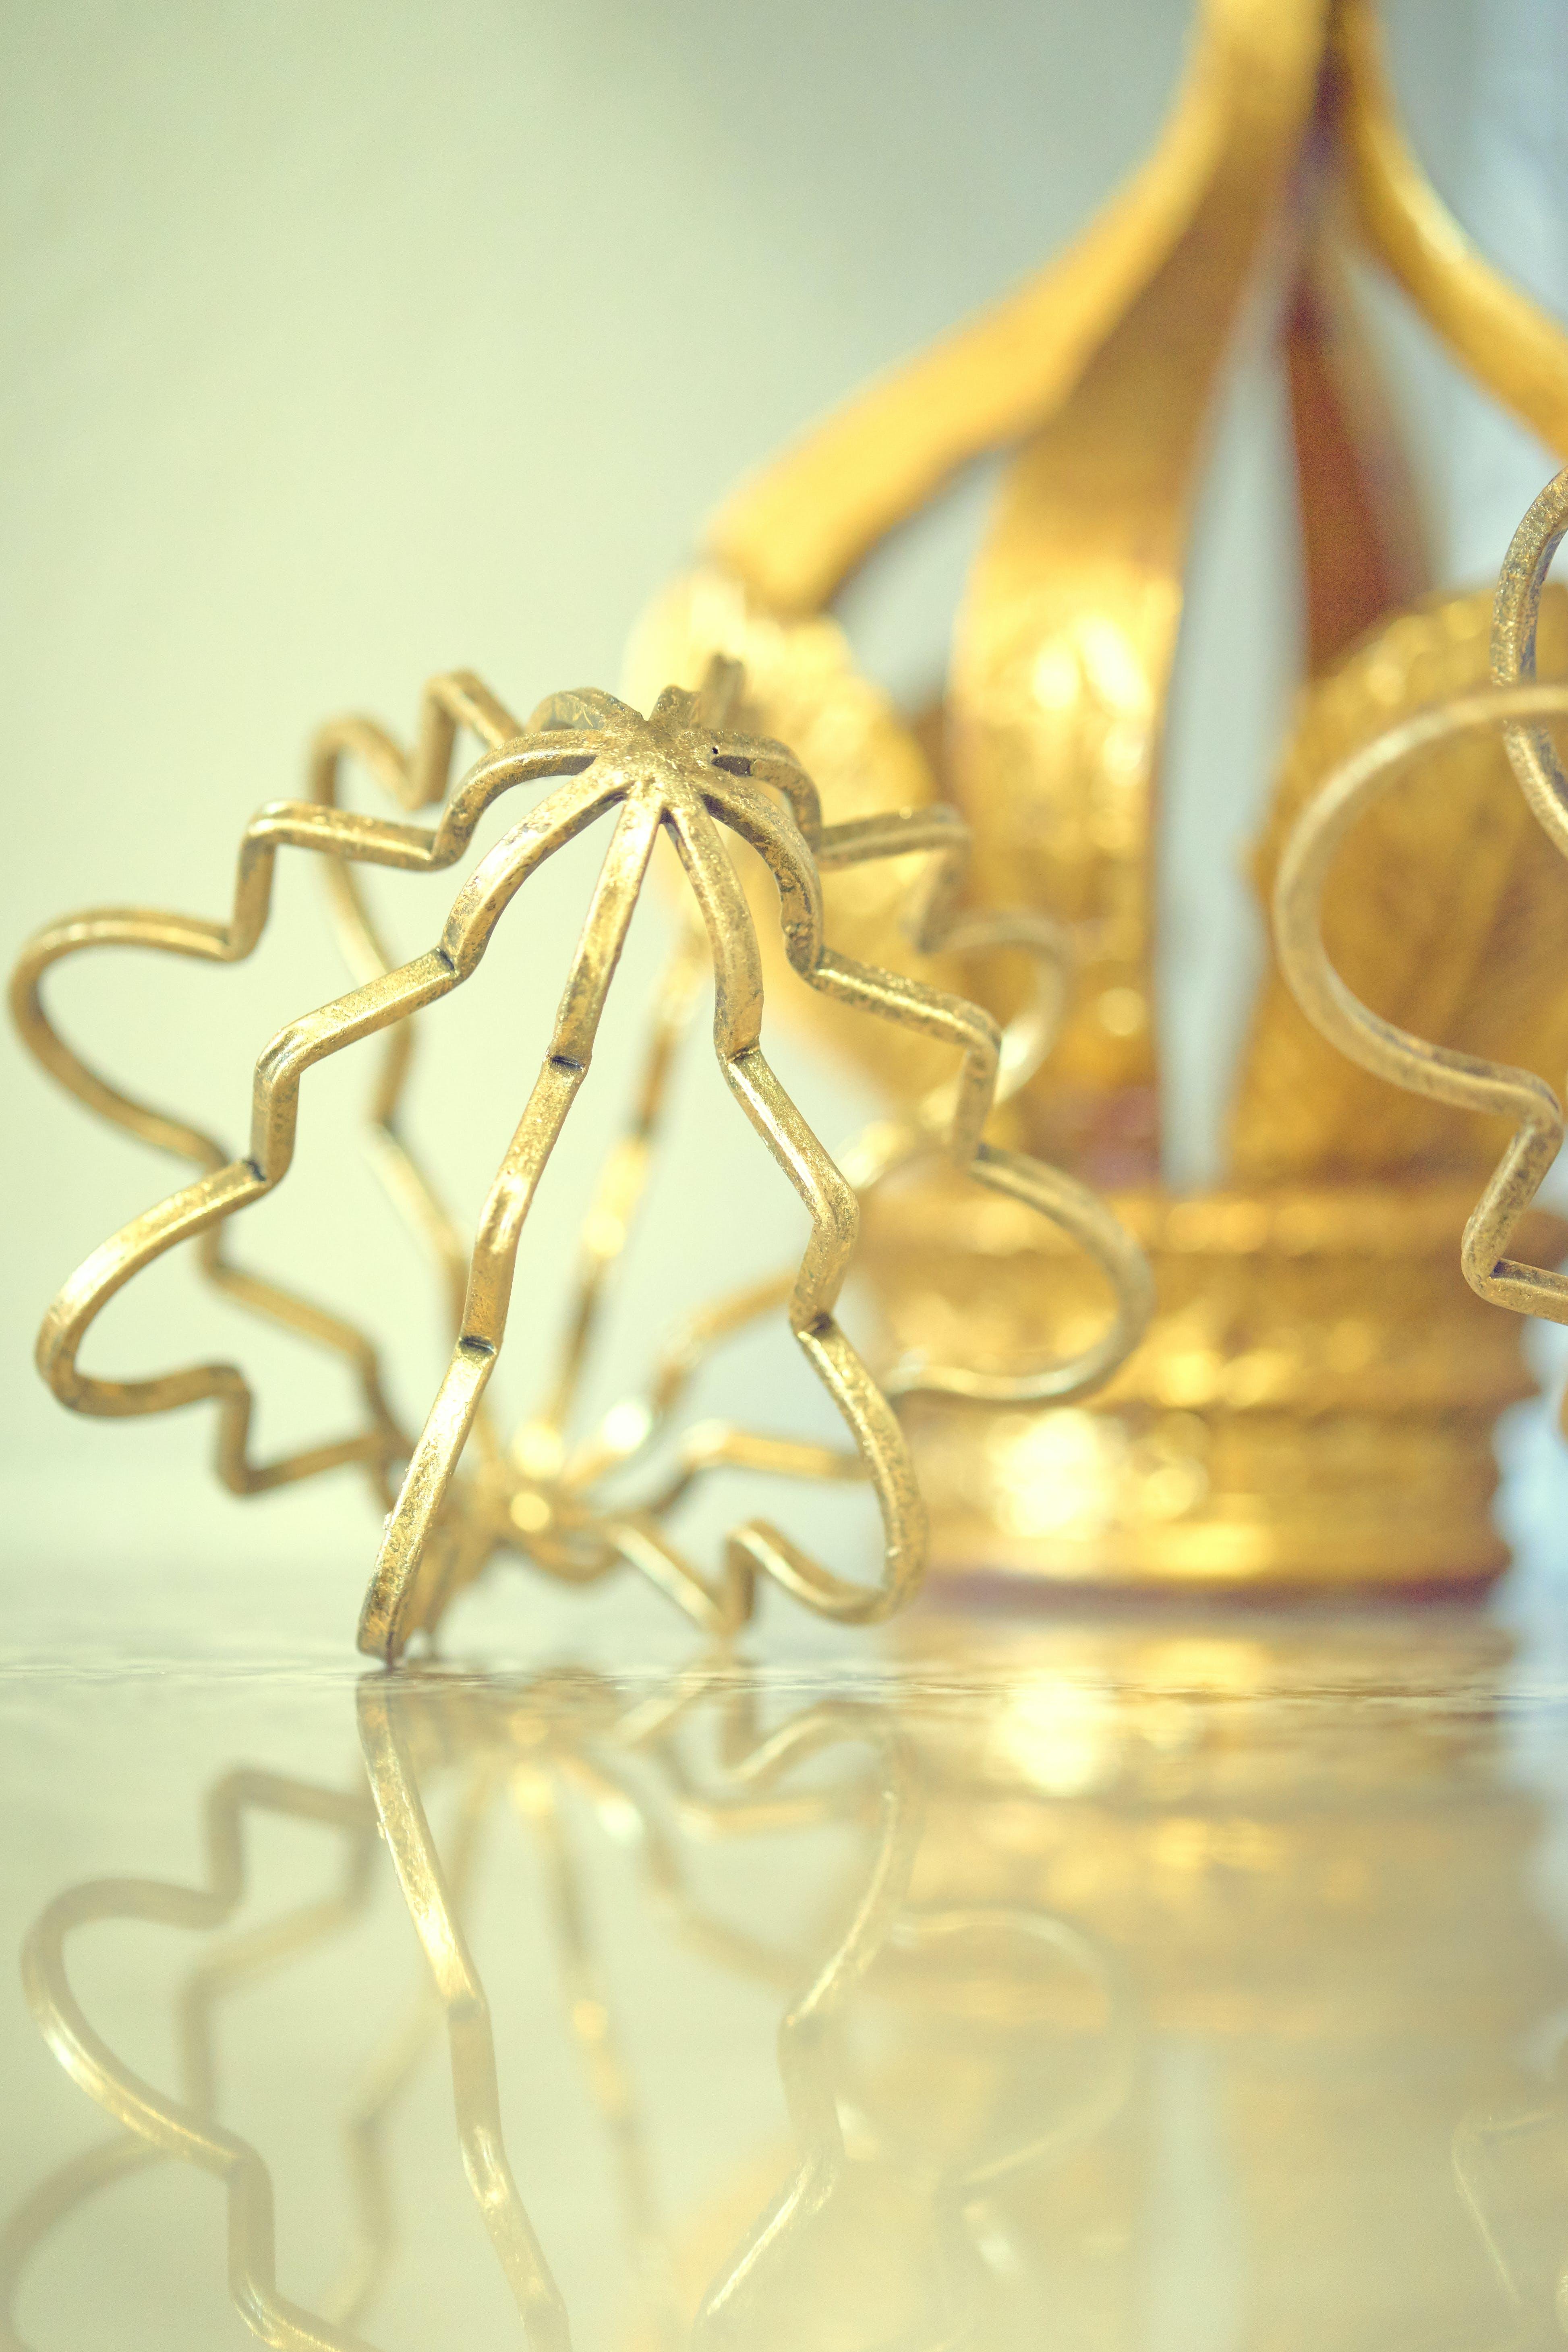 Free stock photo of crown, decor